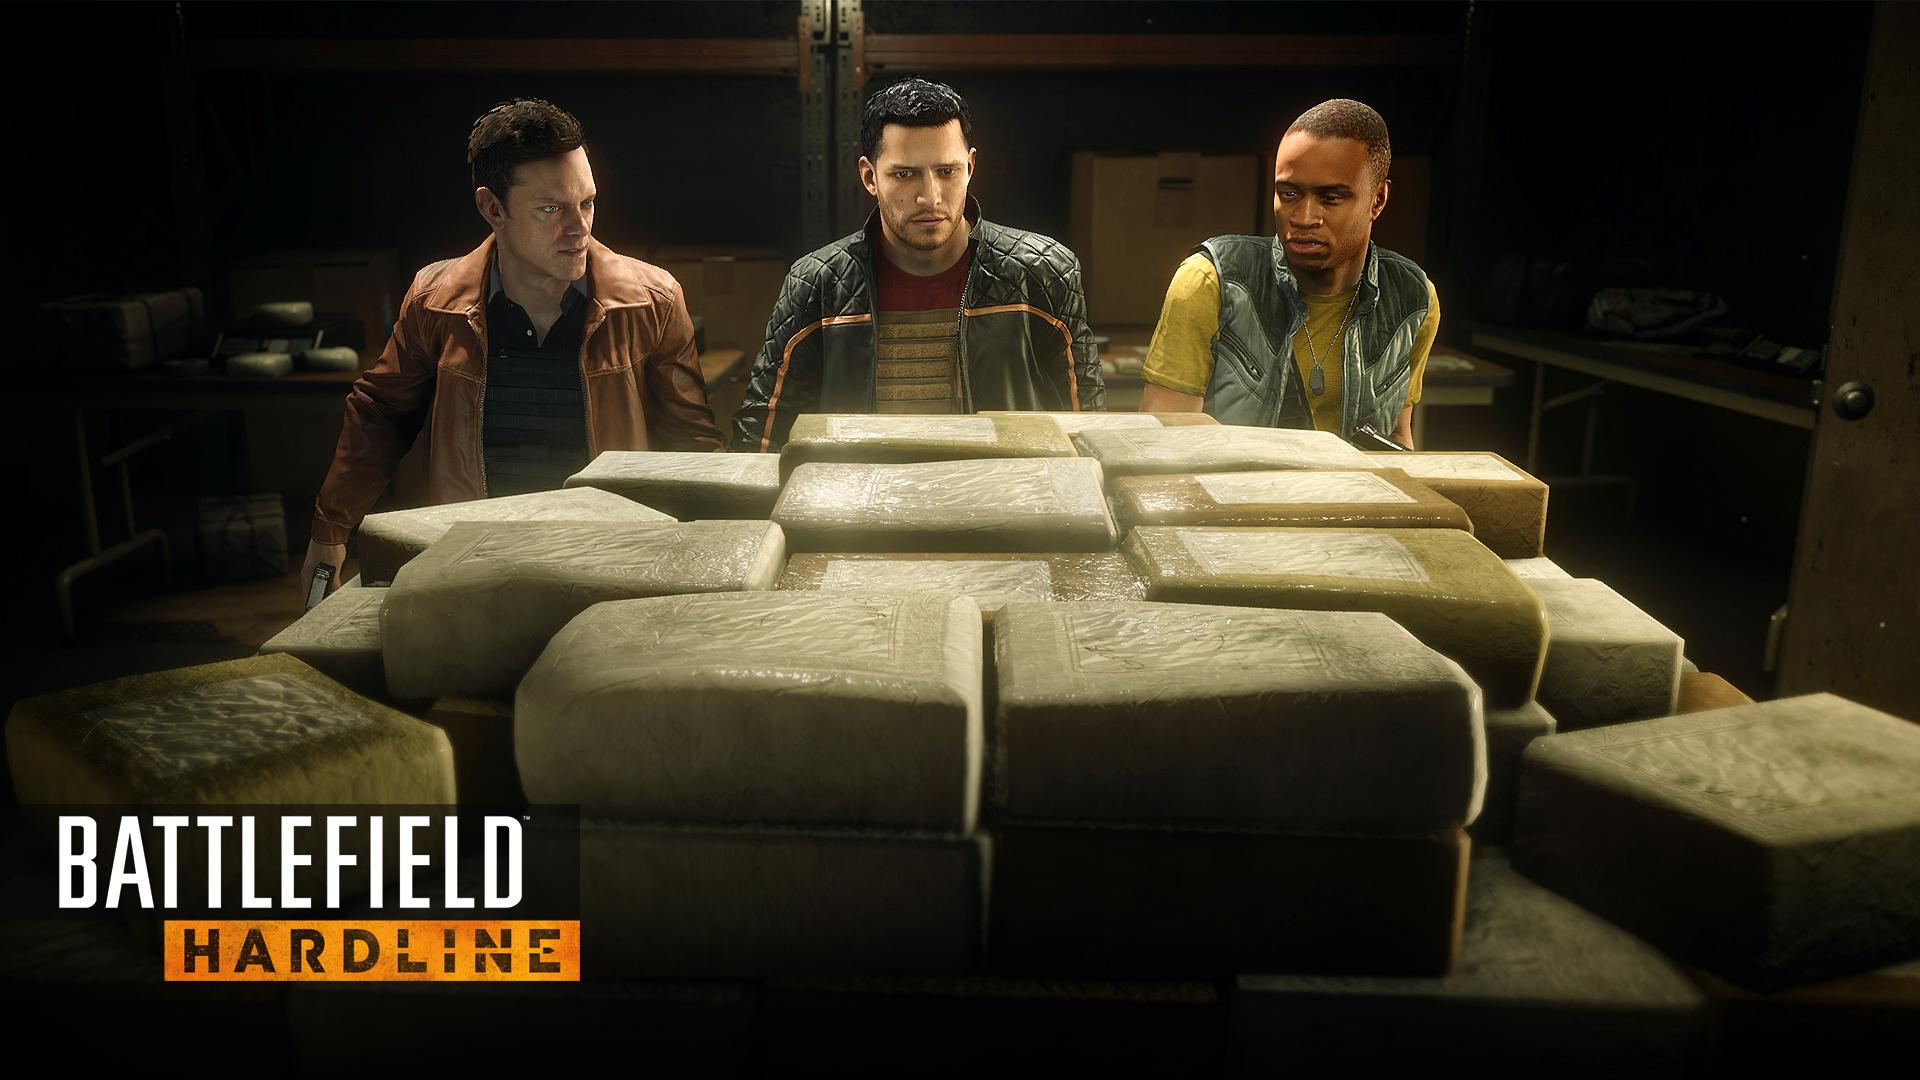 Battlefield Hardline Review